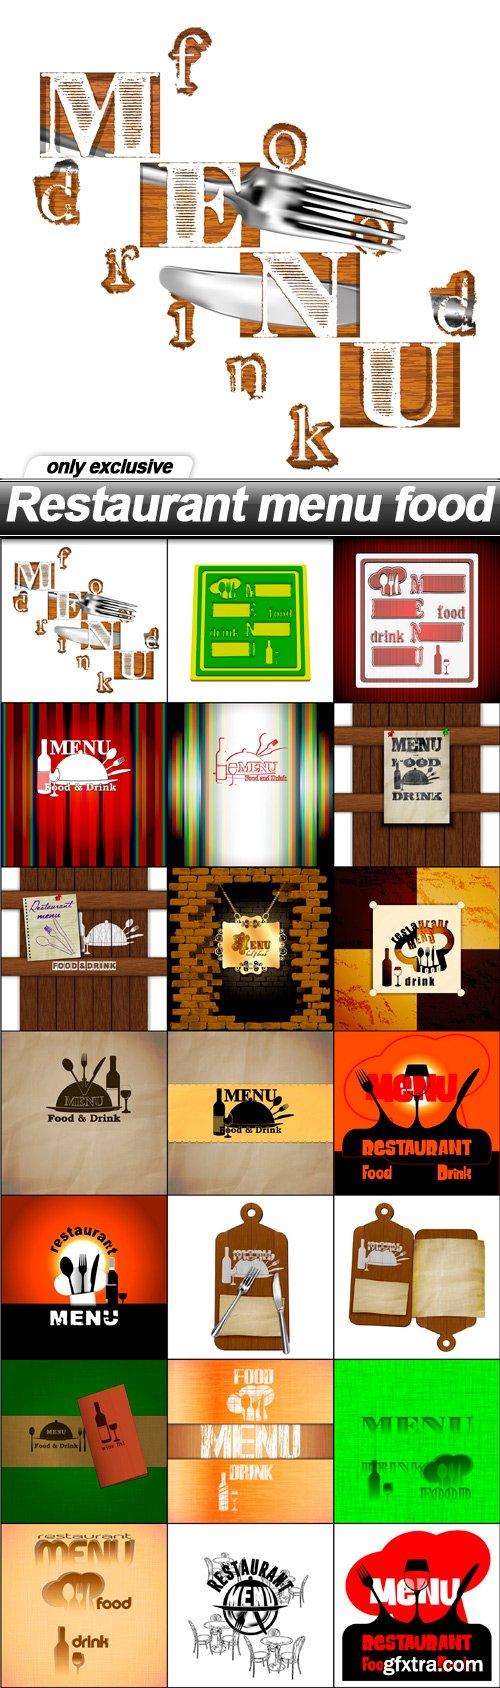 Restaurant menu food - 21 EPS